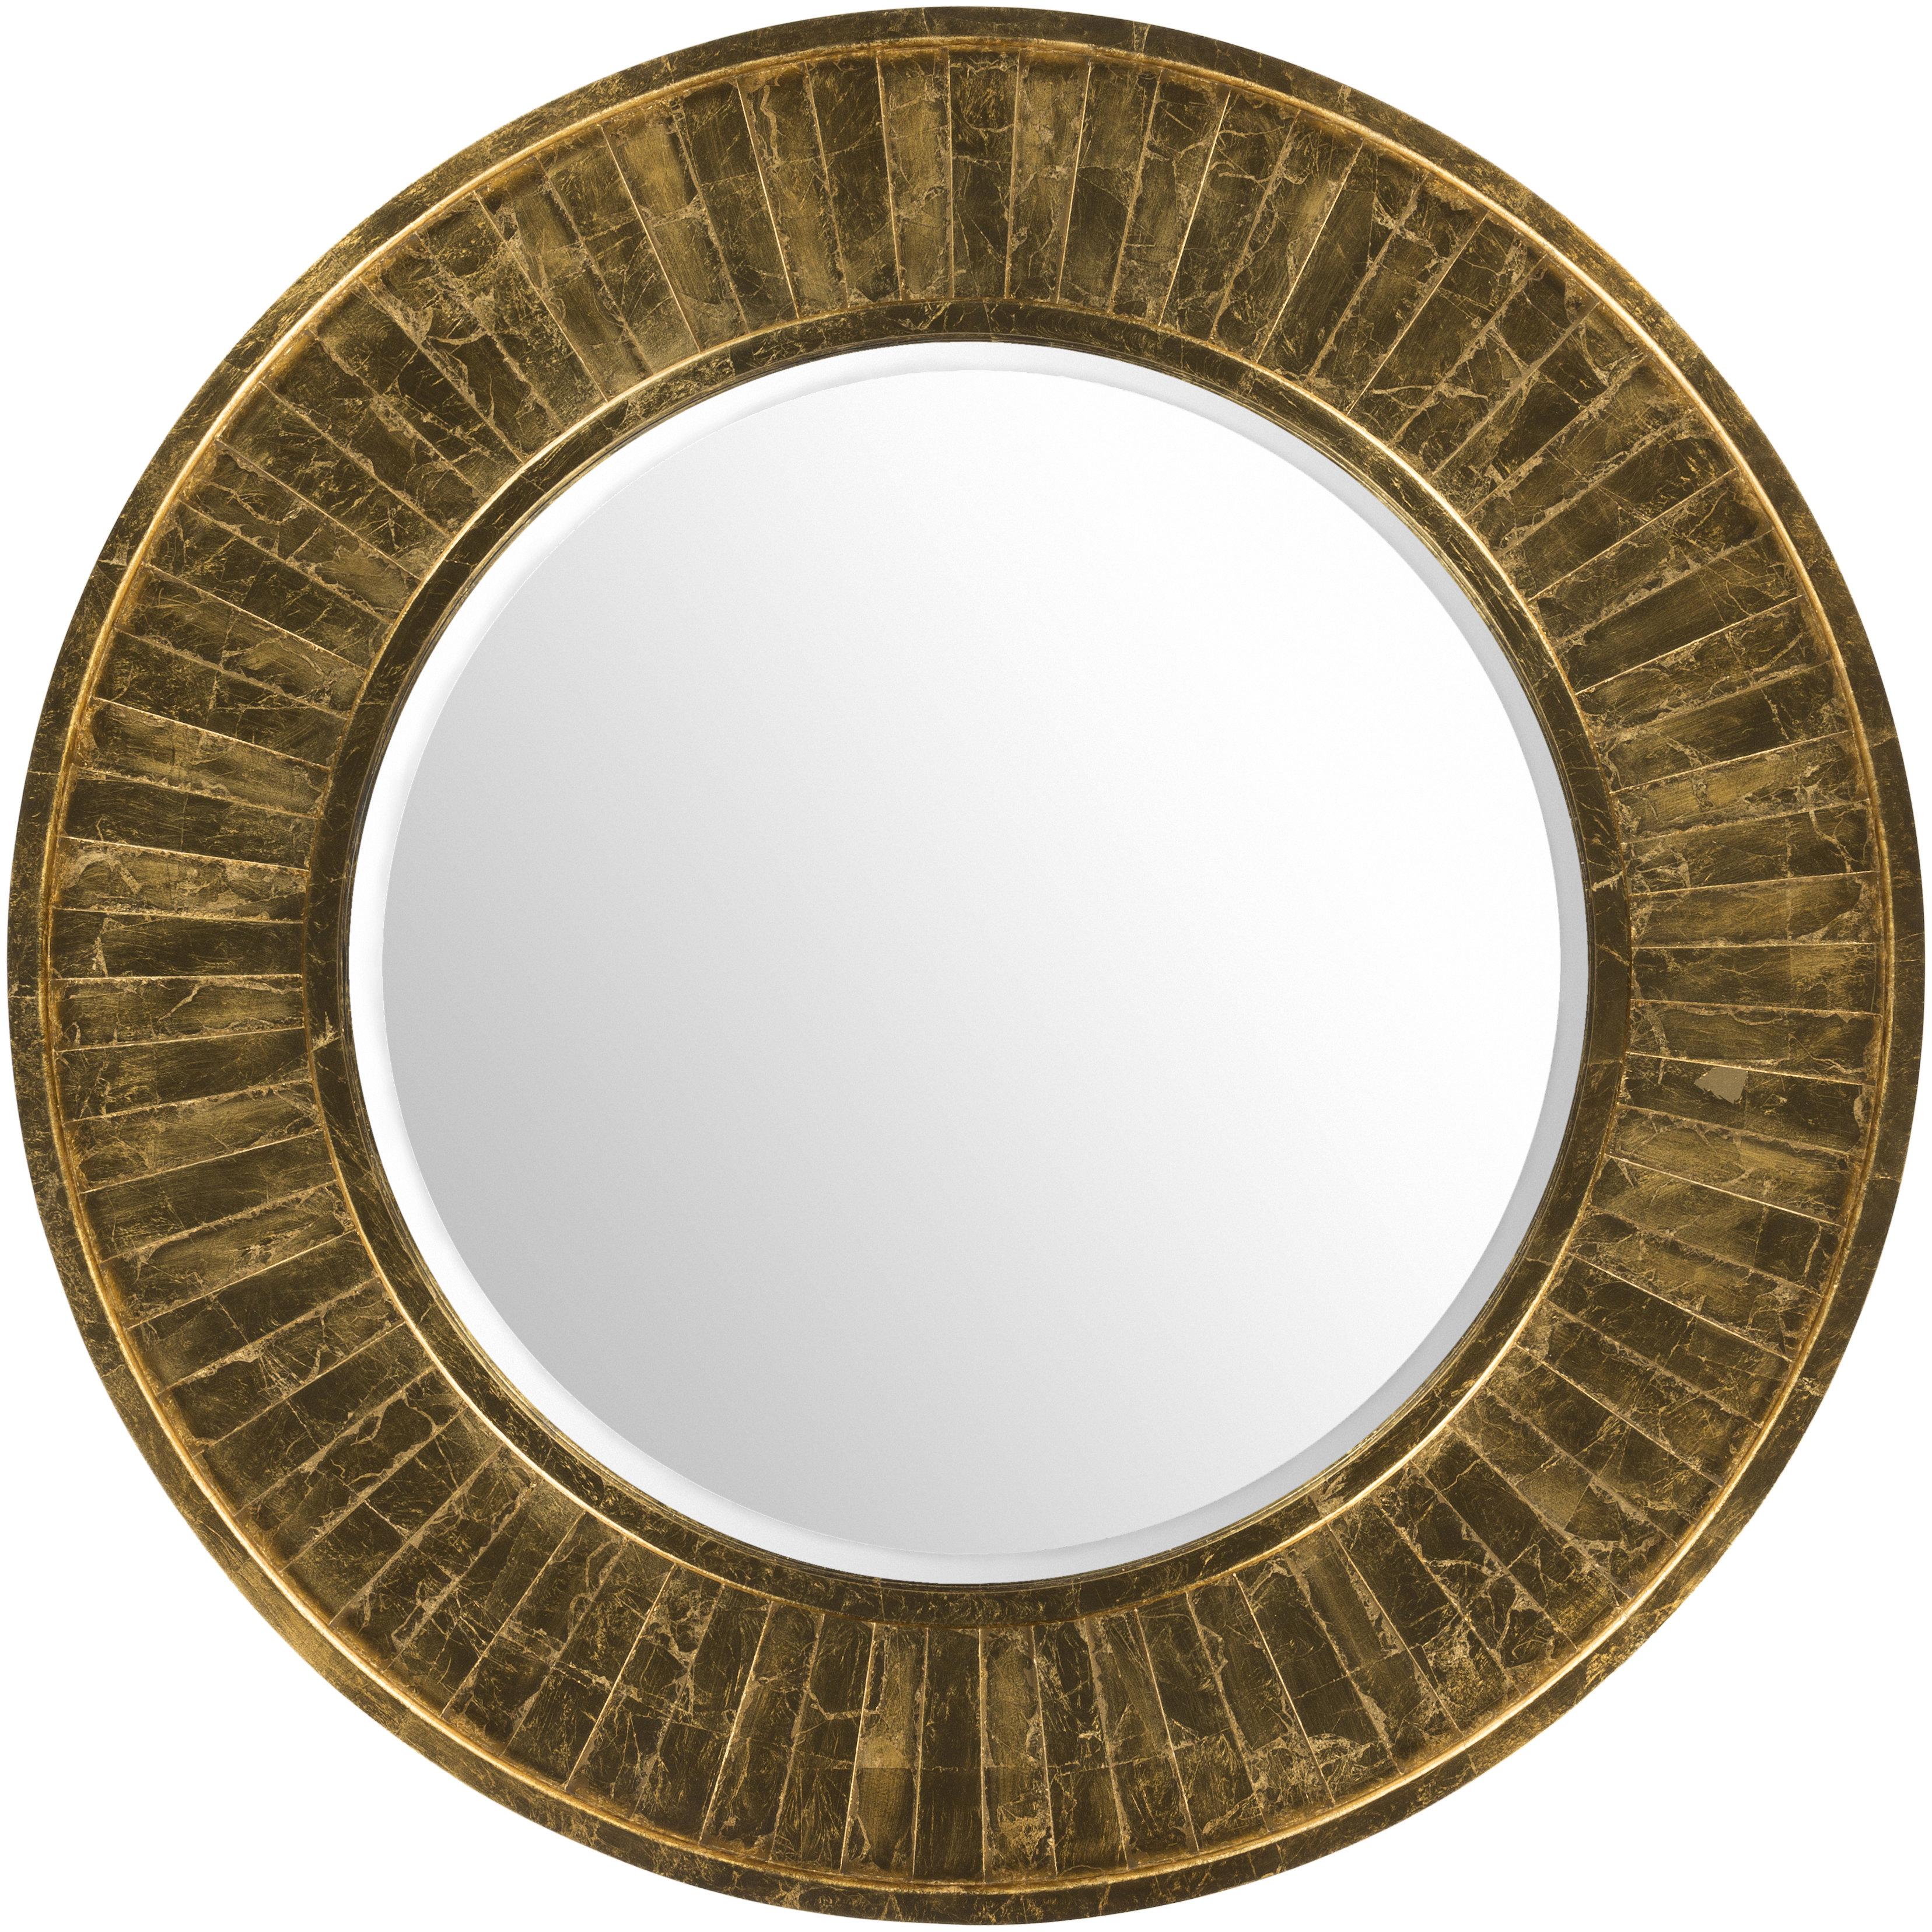 Popular Round Beveled Wall Mirrors Pertaining To Round Beveled Accent Wall Mirror (View 13 of 20)